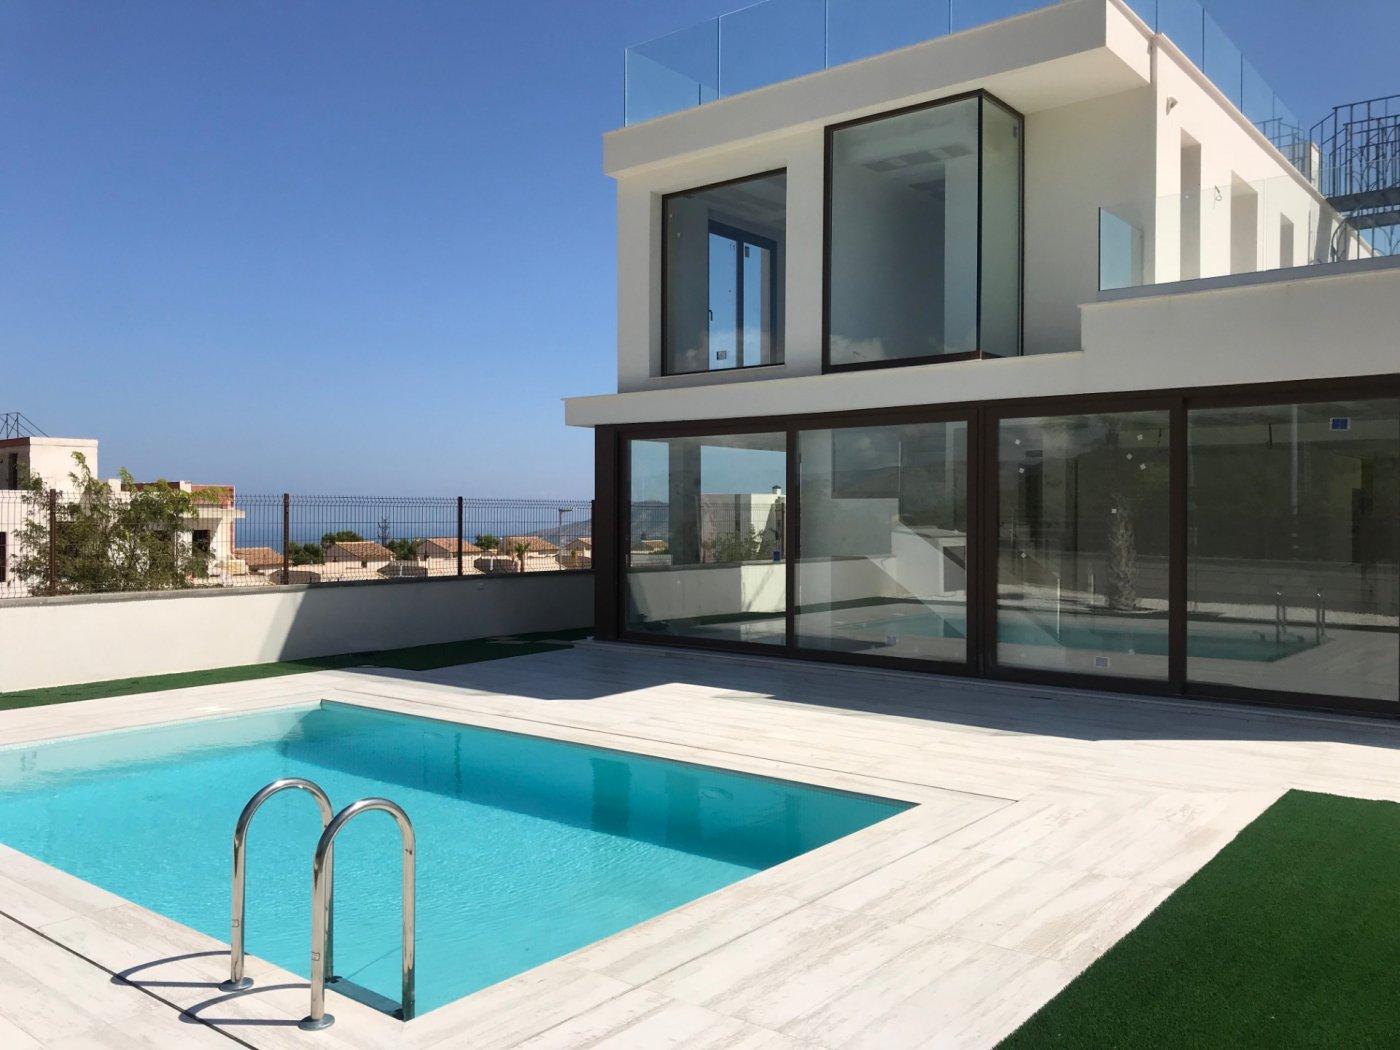 Villa - New Construction - Polop - Polop